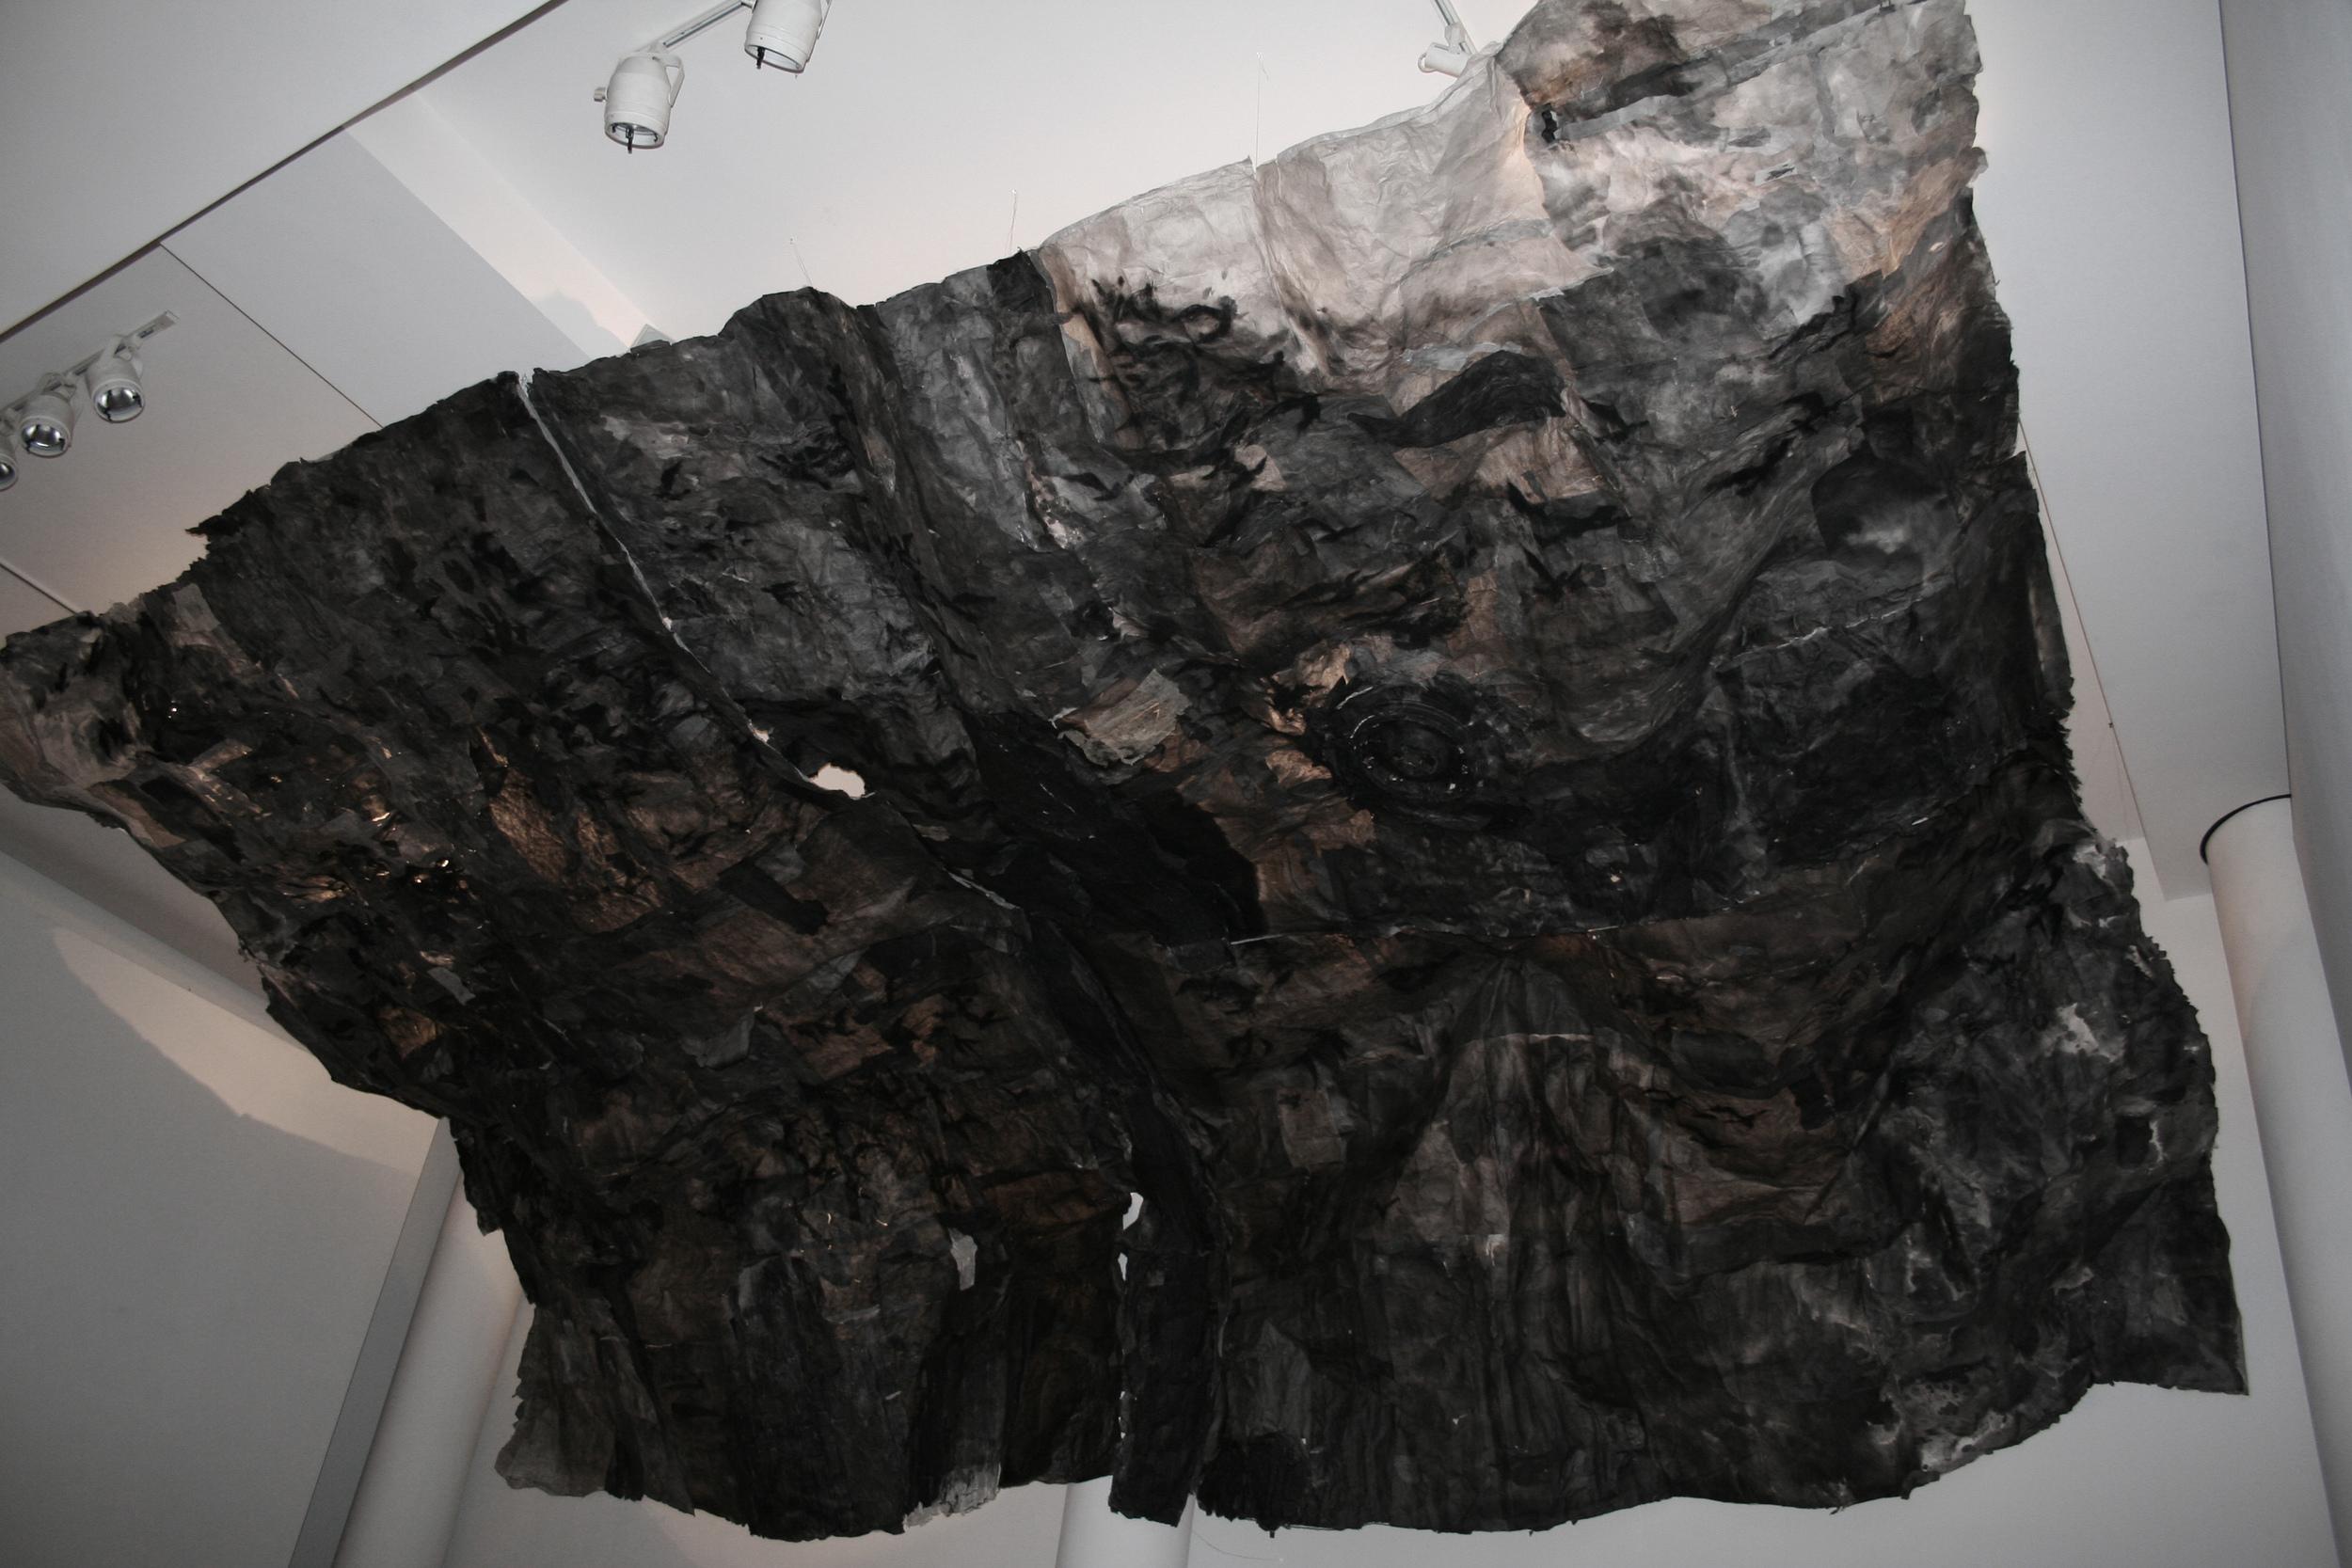 Inhale 吸, 2014 Ink and Xuan paper installation 水墨宣纸装置 30 x 13 x 6 ft.